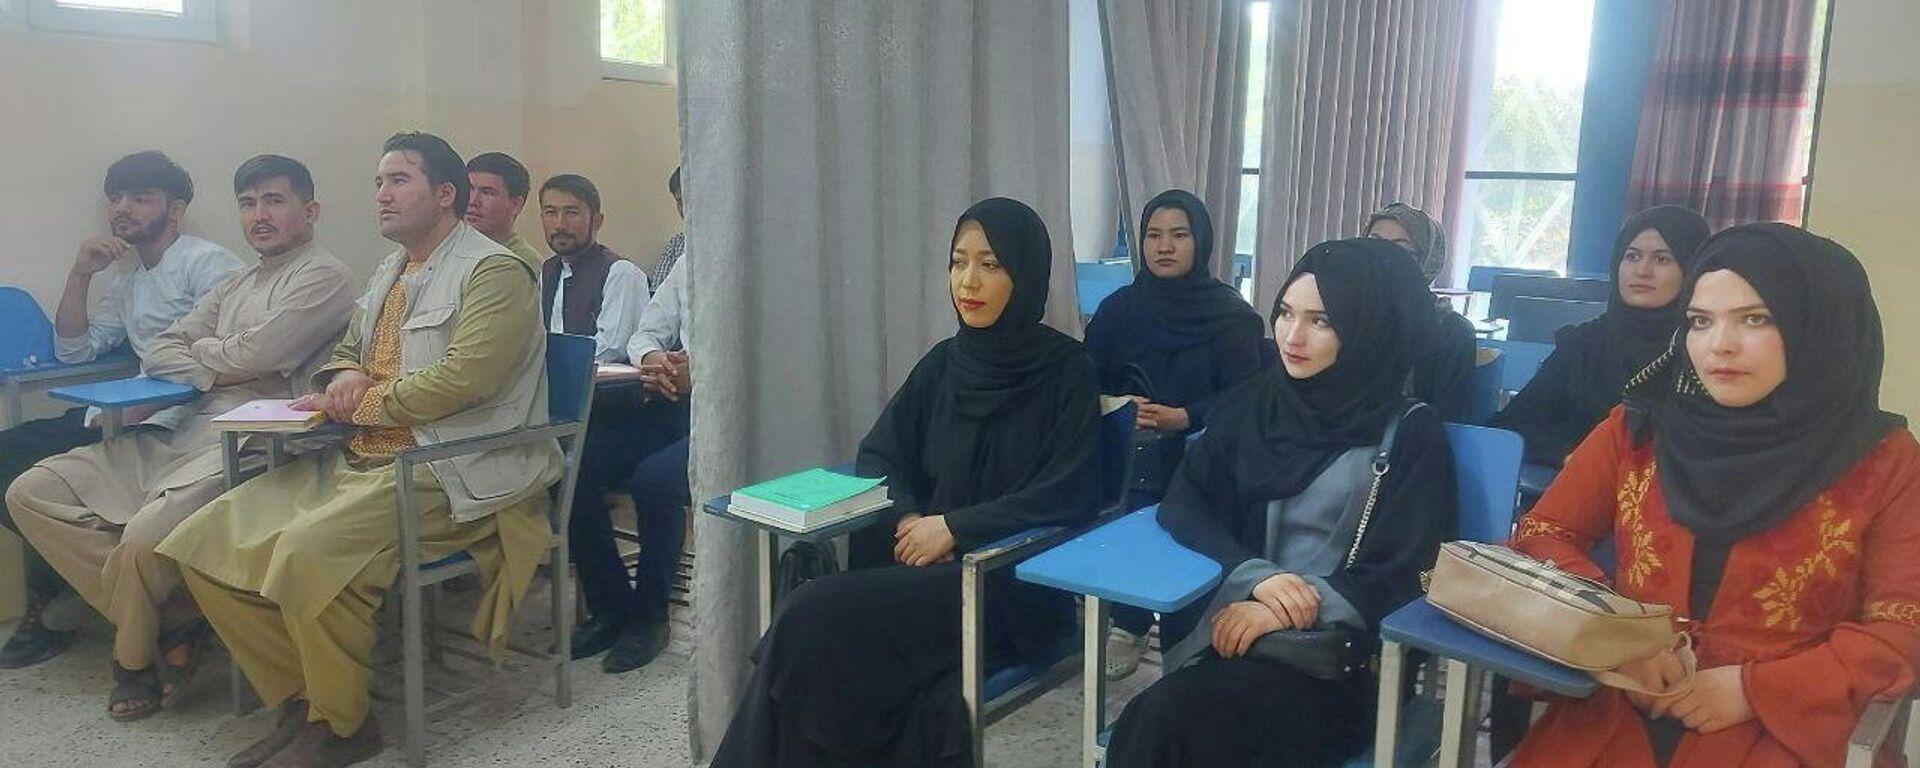 Avicenna University in Kabul - SNA, 1920, 13.09.2021